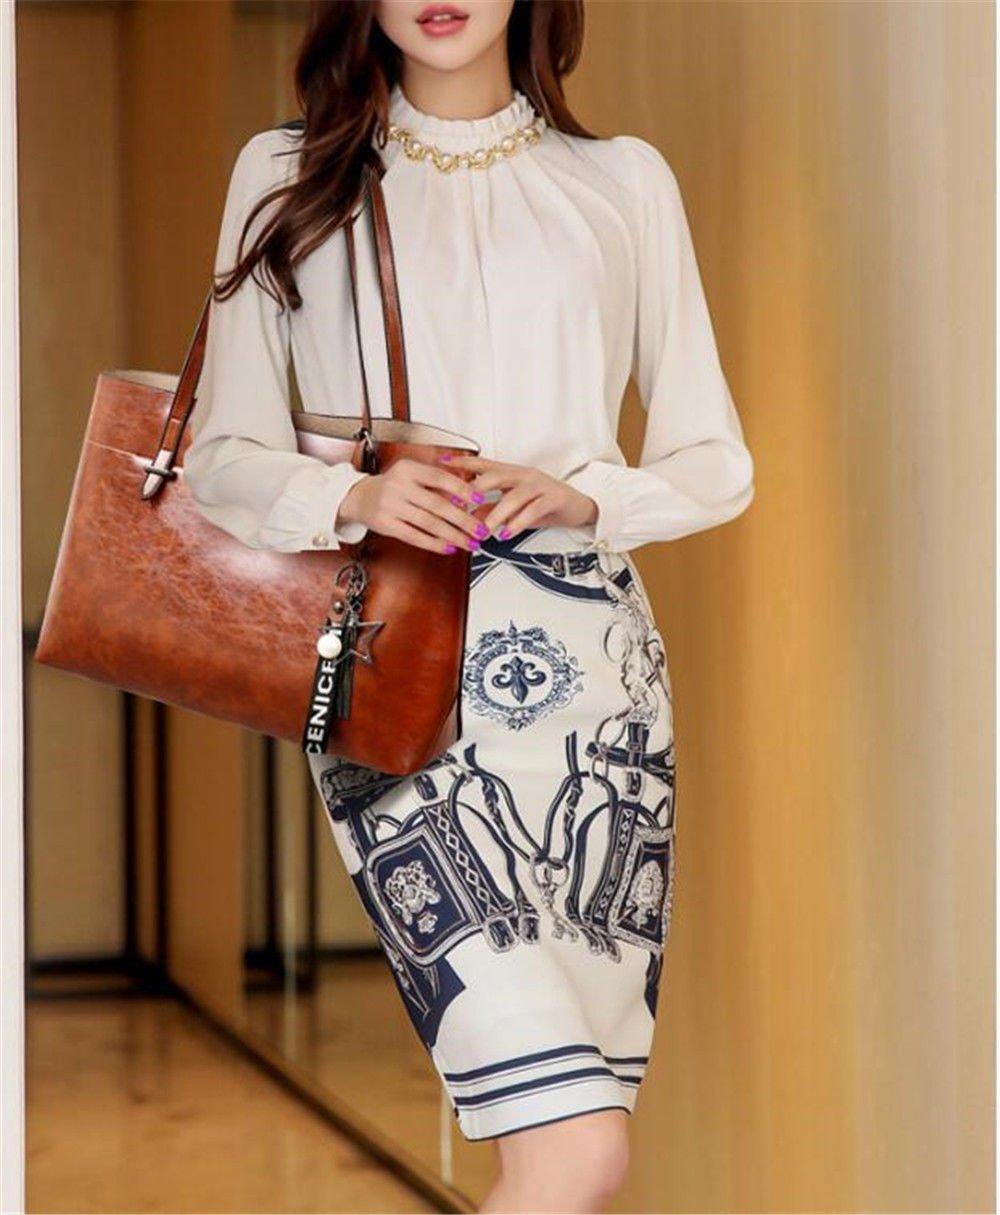 Mother Bag Fashion Back To Ancient Large Capacity Single Shoulder Bag,Black,Three Piece Set by SJMMBB (Image #2)